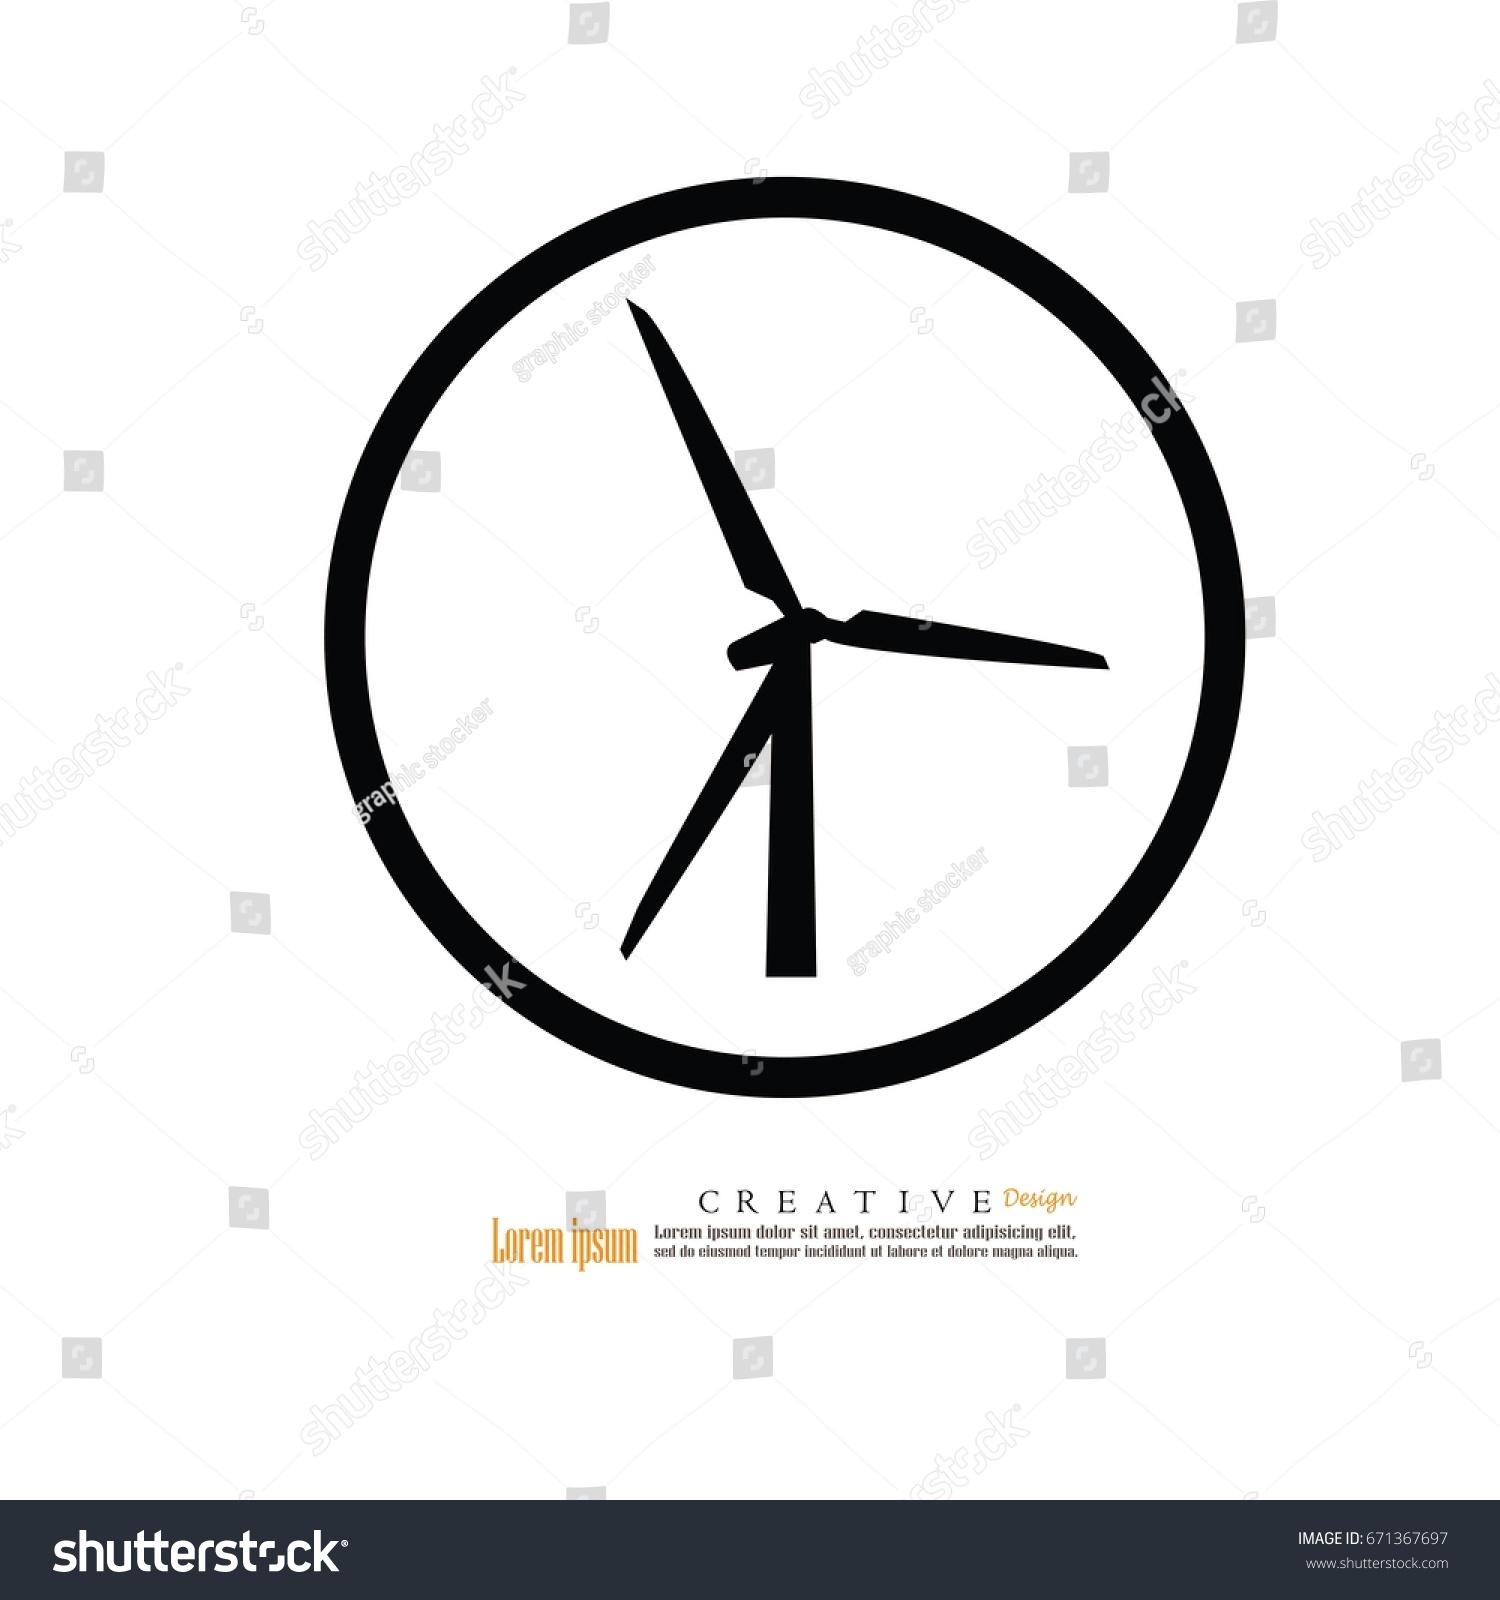 Windturbine Iconvector Illustration Stock Vector 671367697 ...